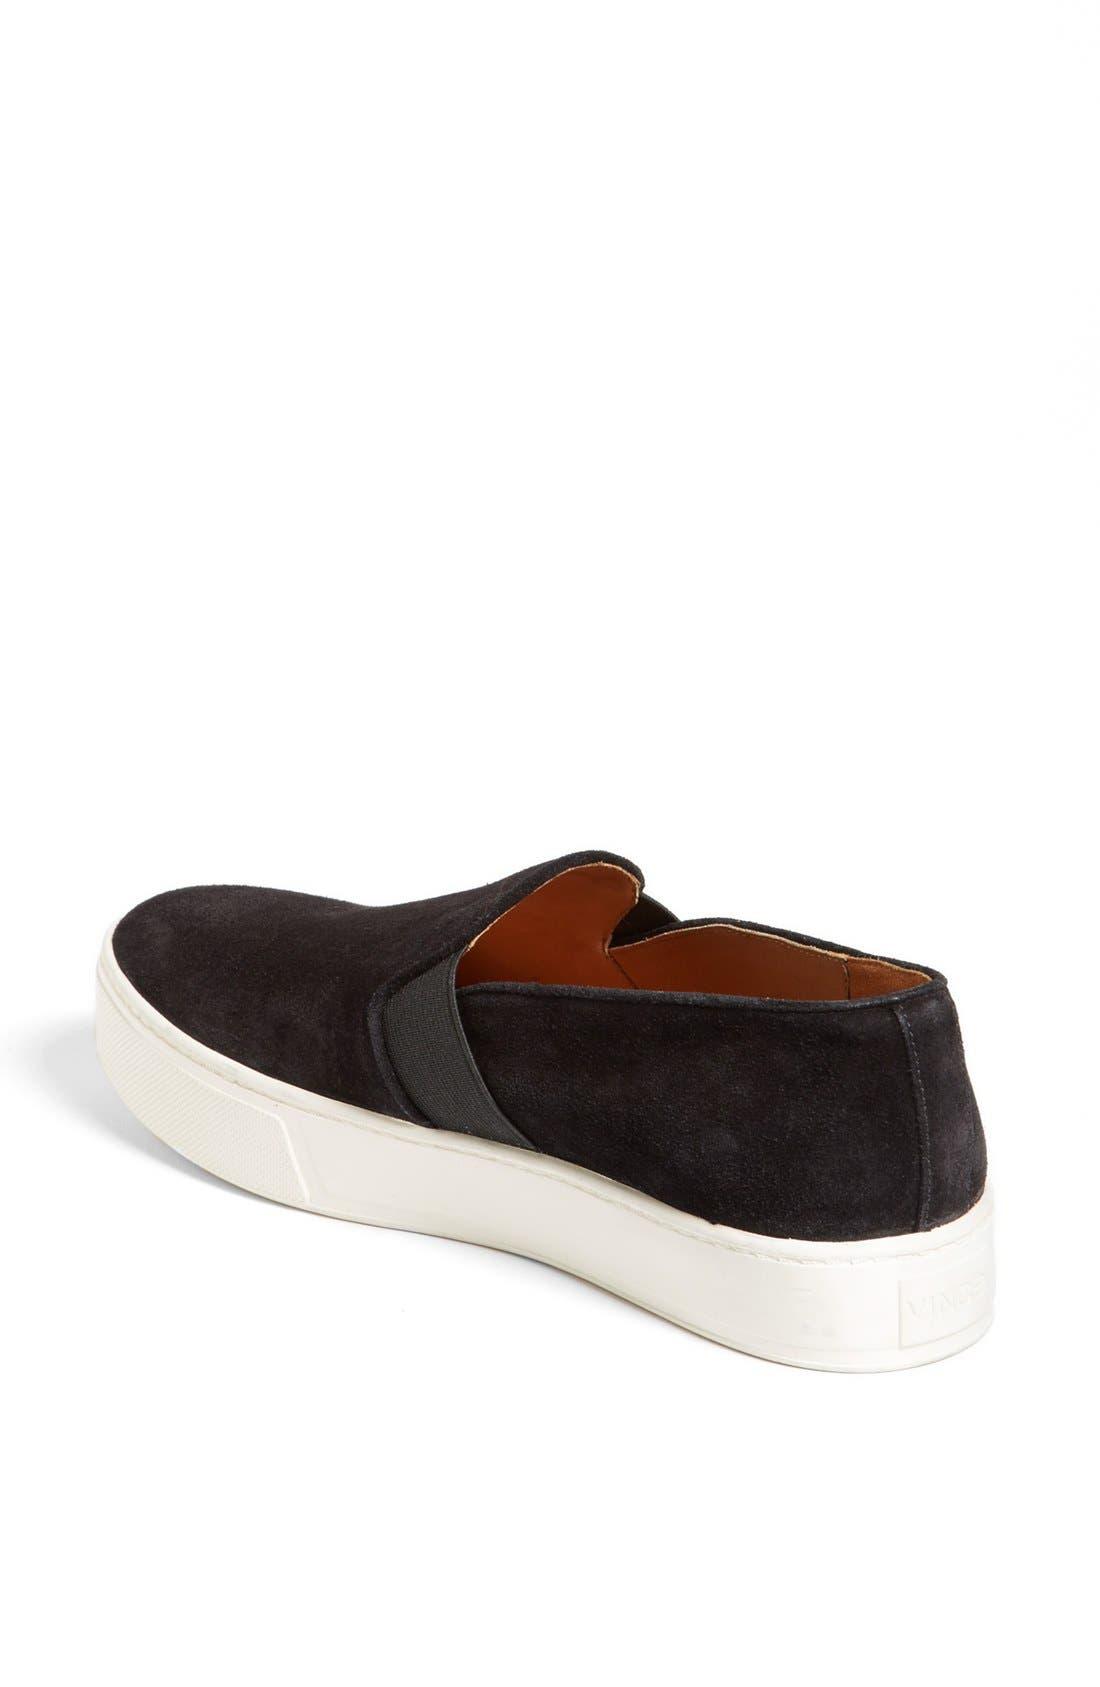 'Blair 3' Sneaker,                             Alternate thumbnail 2, color,                             Black